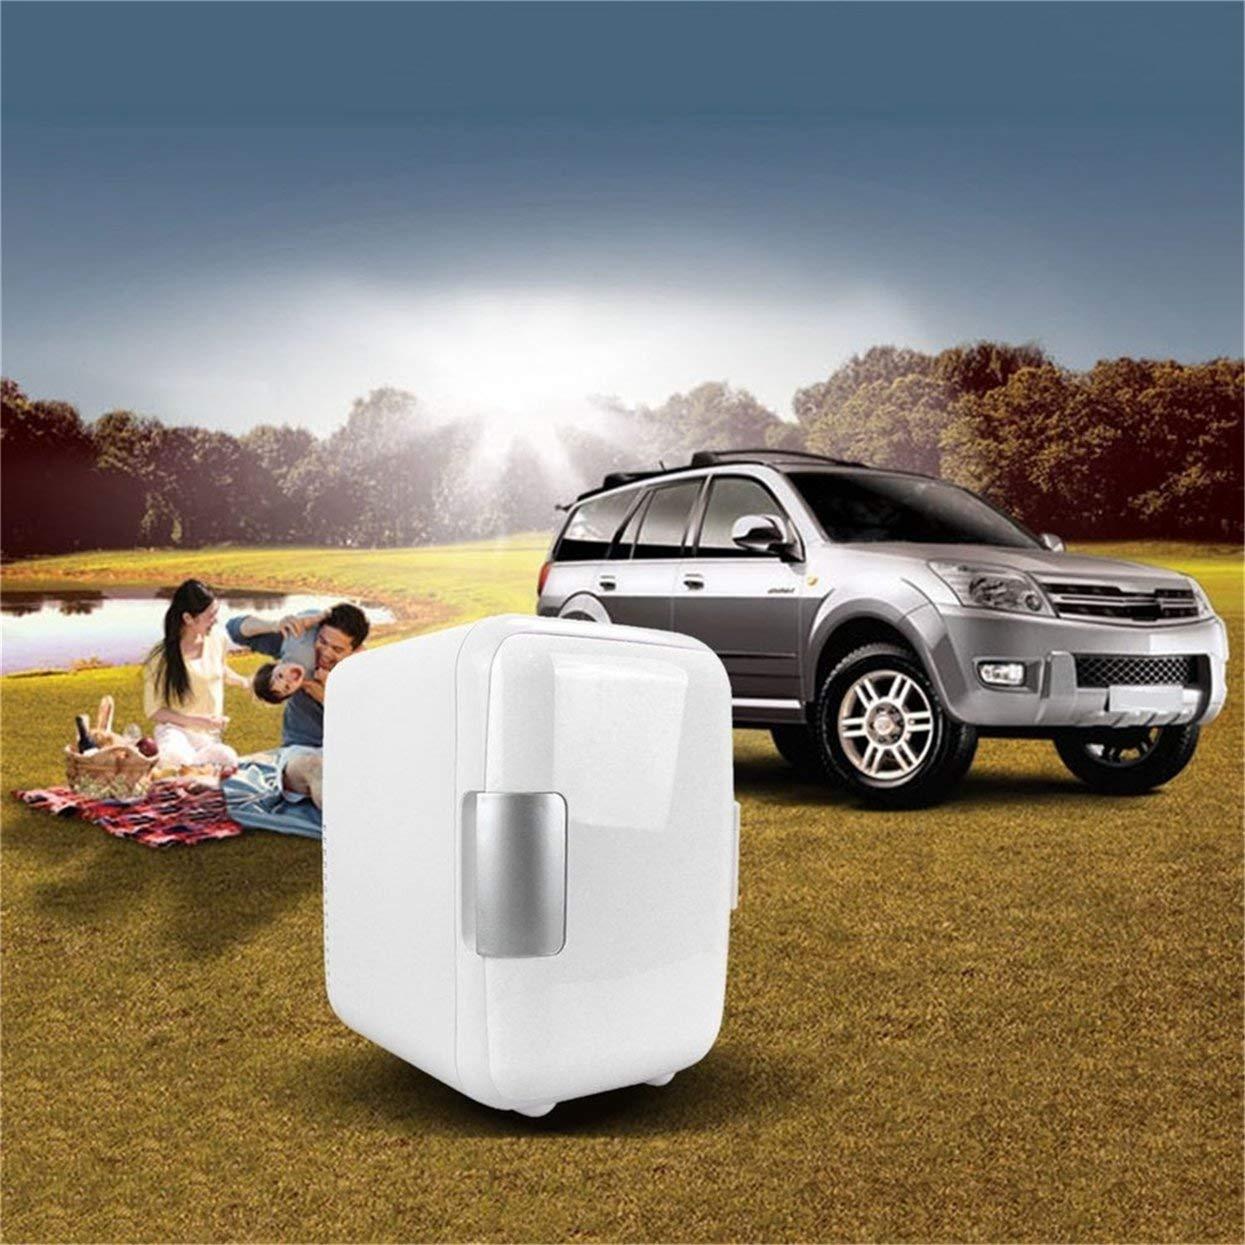 anyilon Dual-Use 4L Home Car Use Refrigerators Ultra Quiet Low Noise Car Mini Refrigerators Freezer Cooling Heating Box Fridge by anyilon (Image #4)